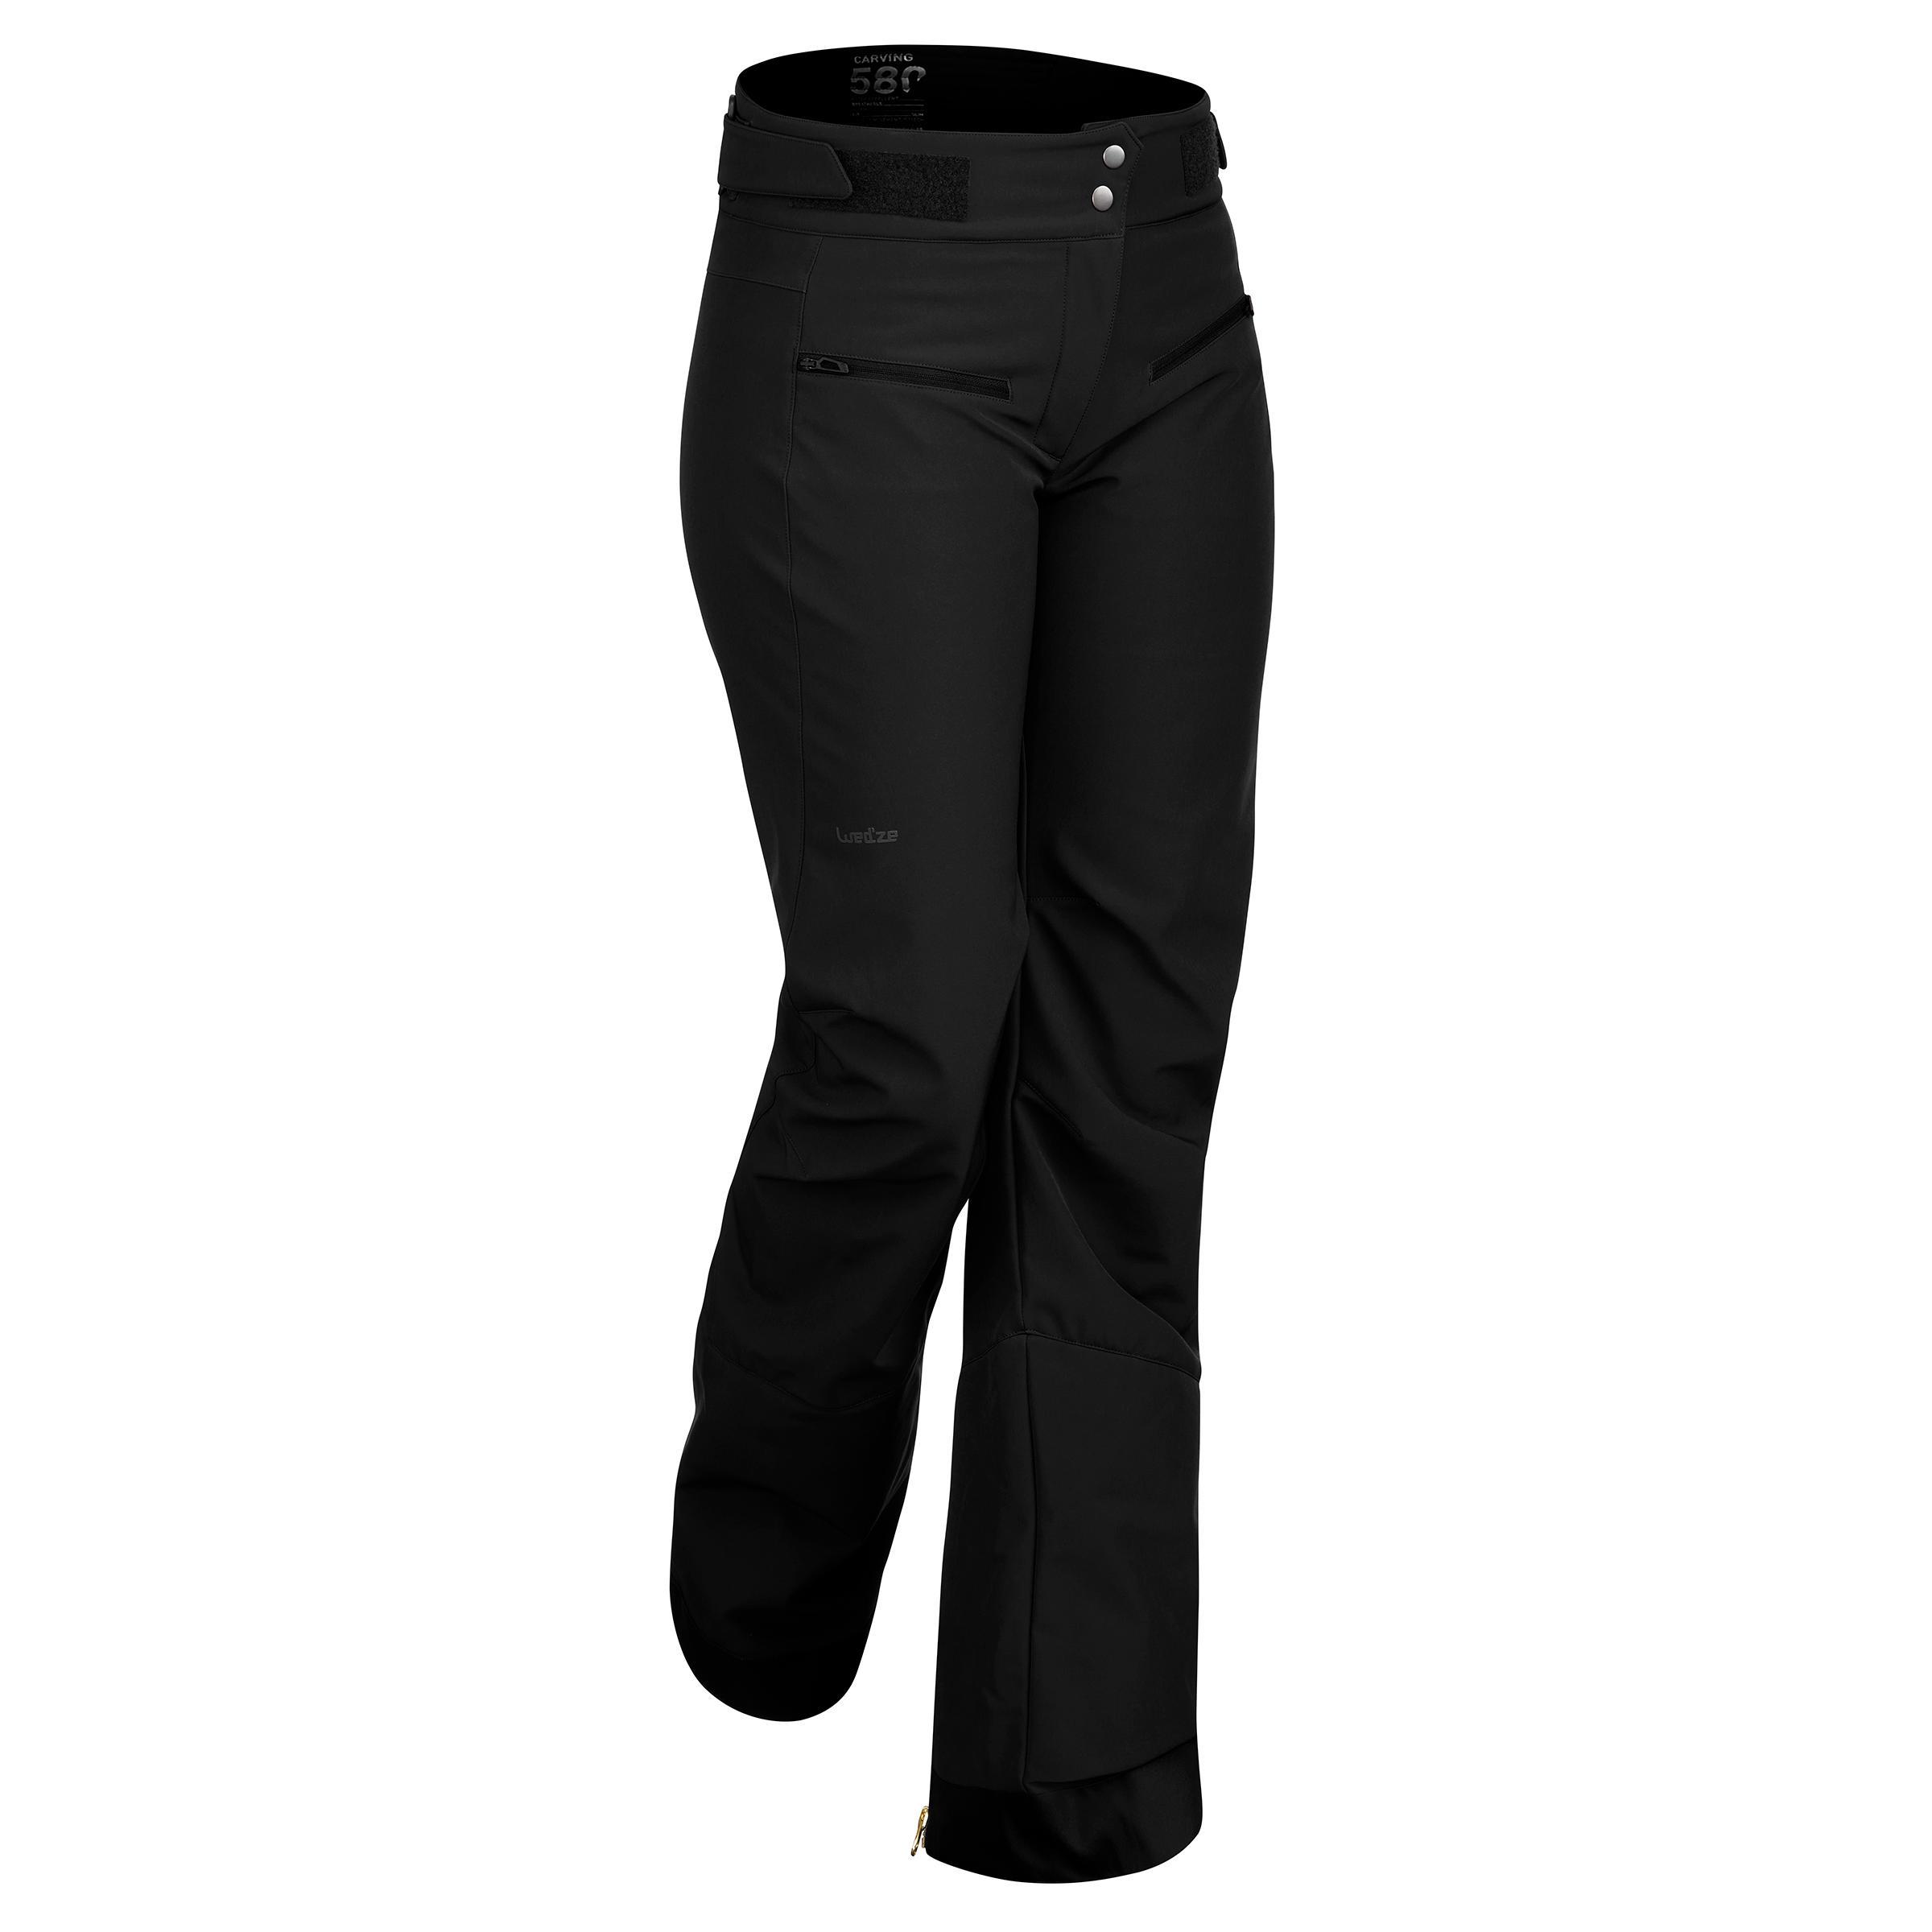 5e7b7e7a53 Comprar Pantalones Esquí de Hombre y Mujer